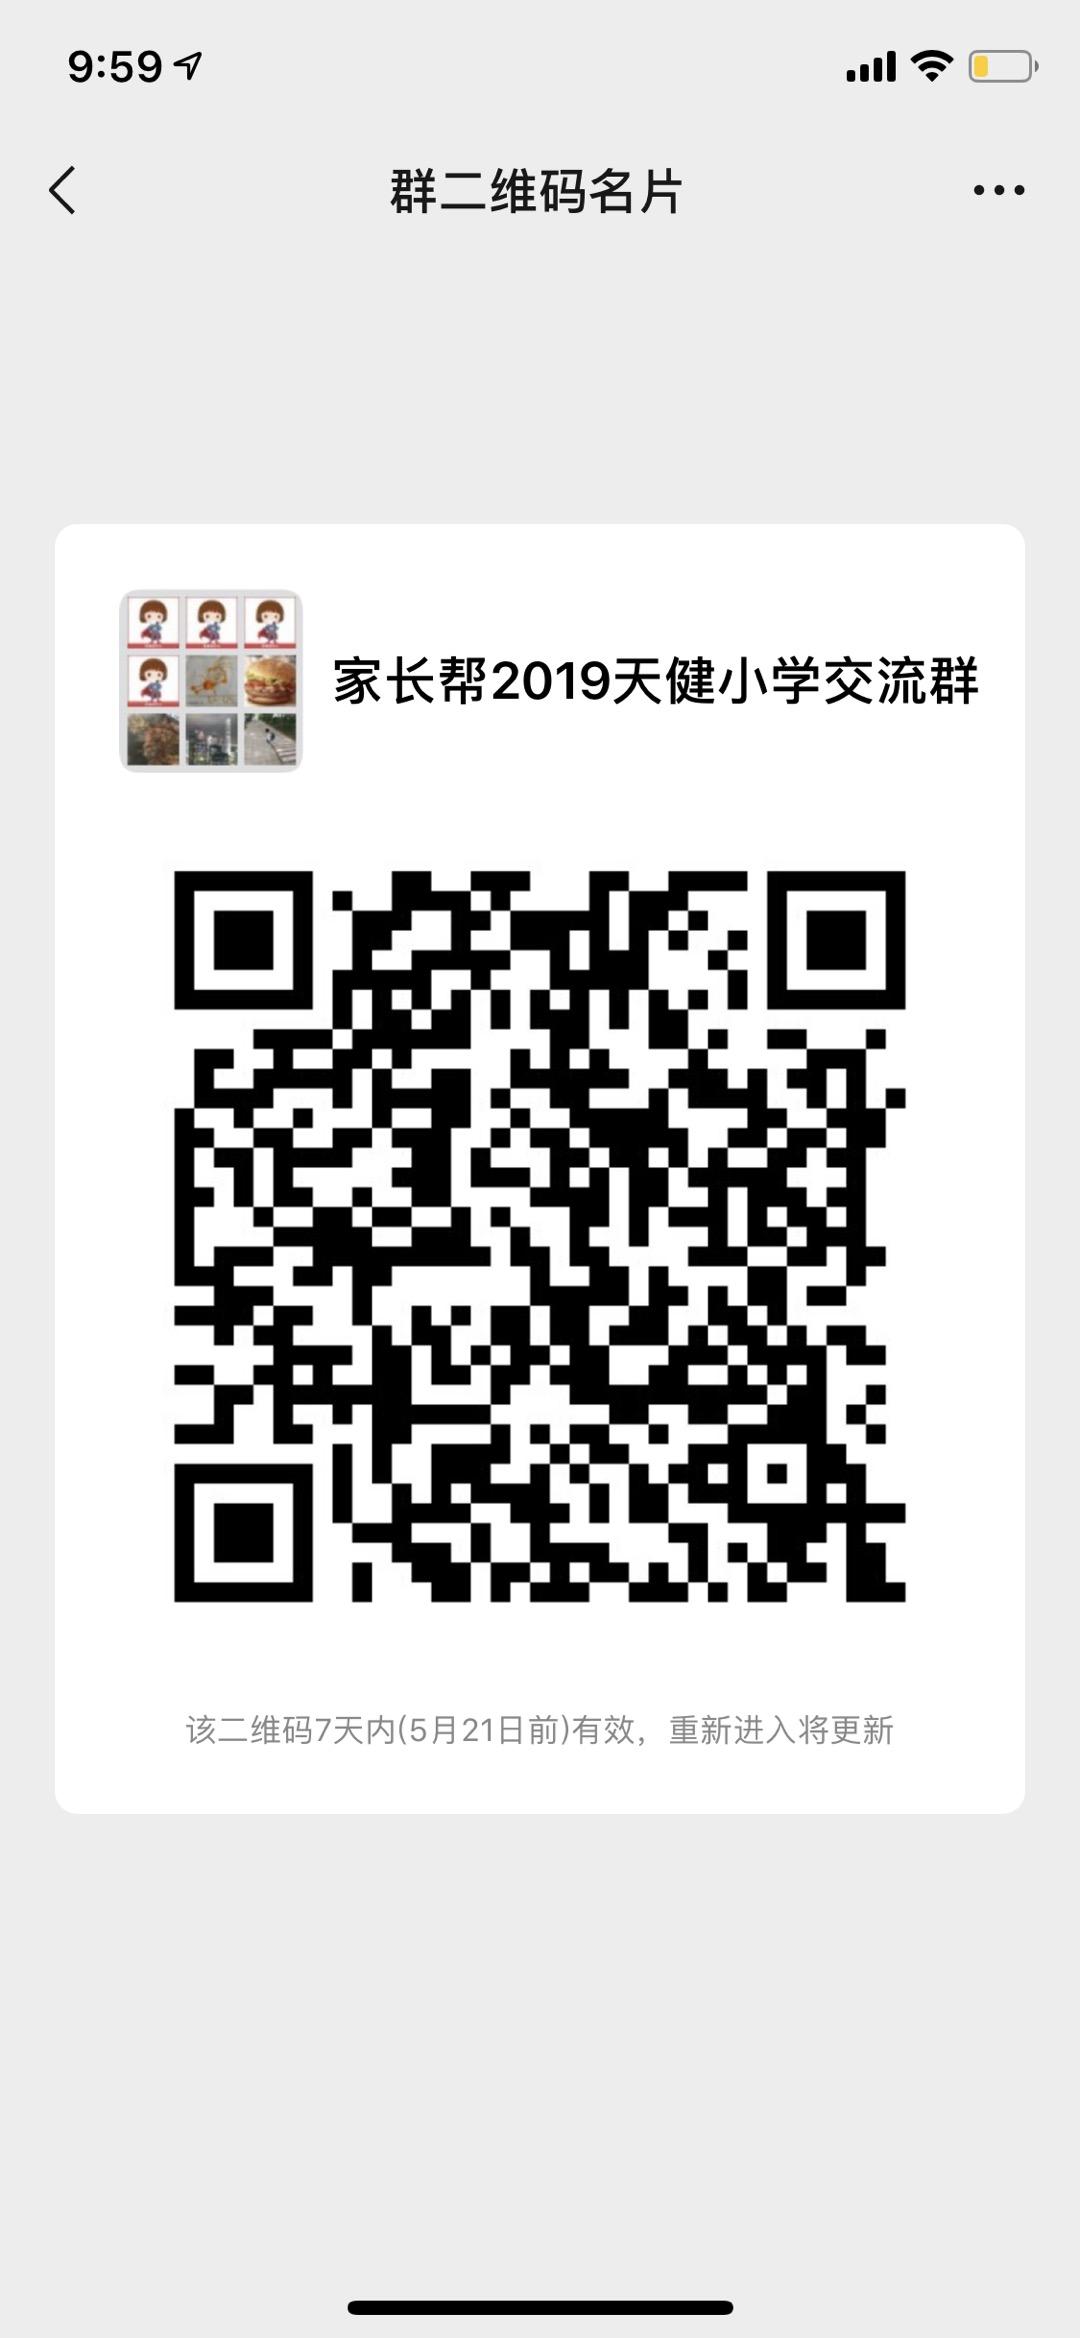 3CD56F6C-1B24-487B-8AA7-ABE172ABFD02.jpg